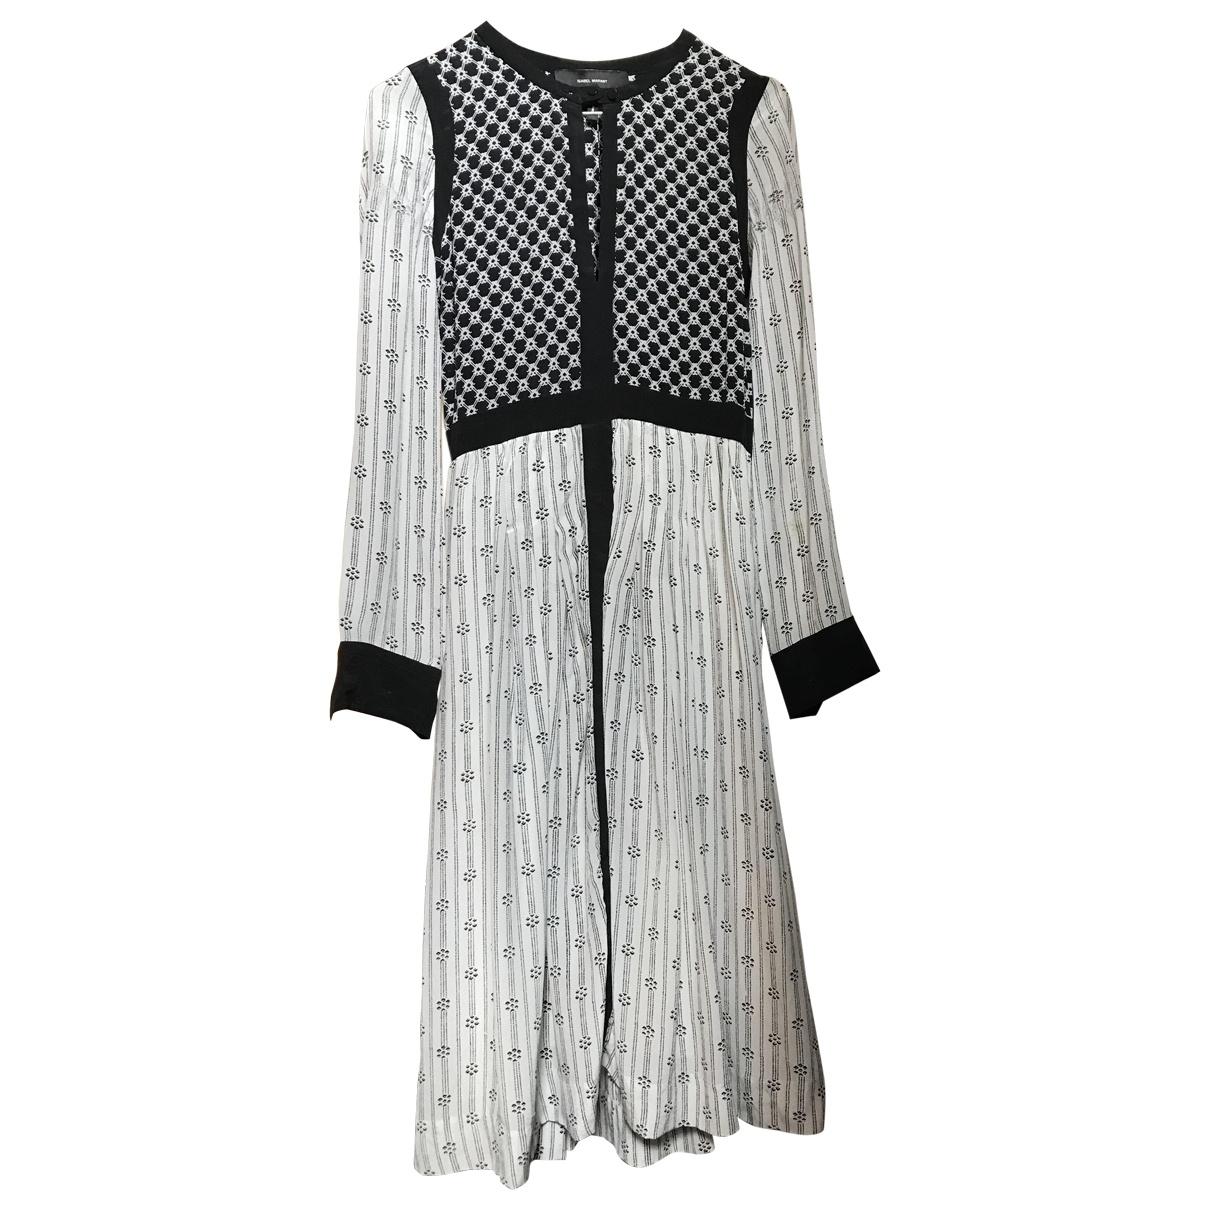 Isabel Marant \N Kleid in  Weiss / Schwarz Seide